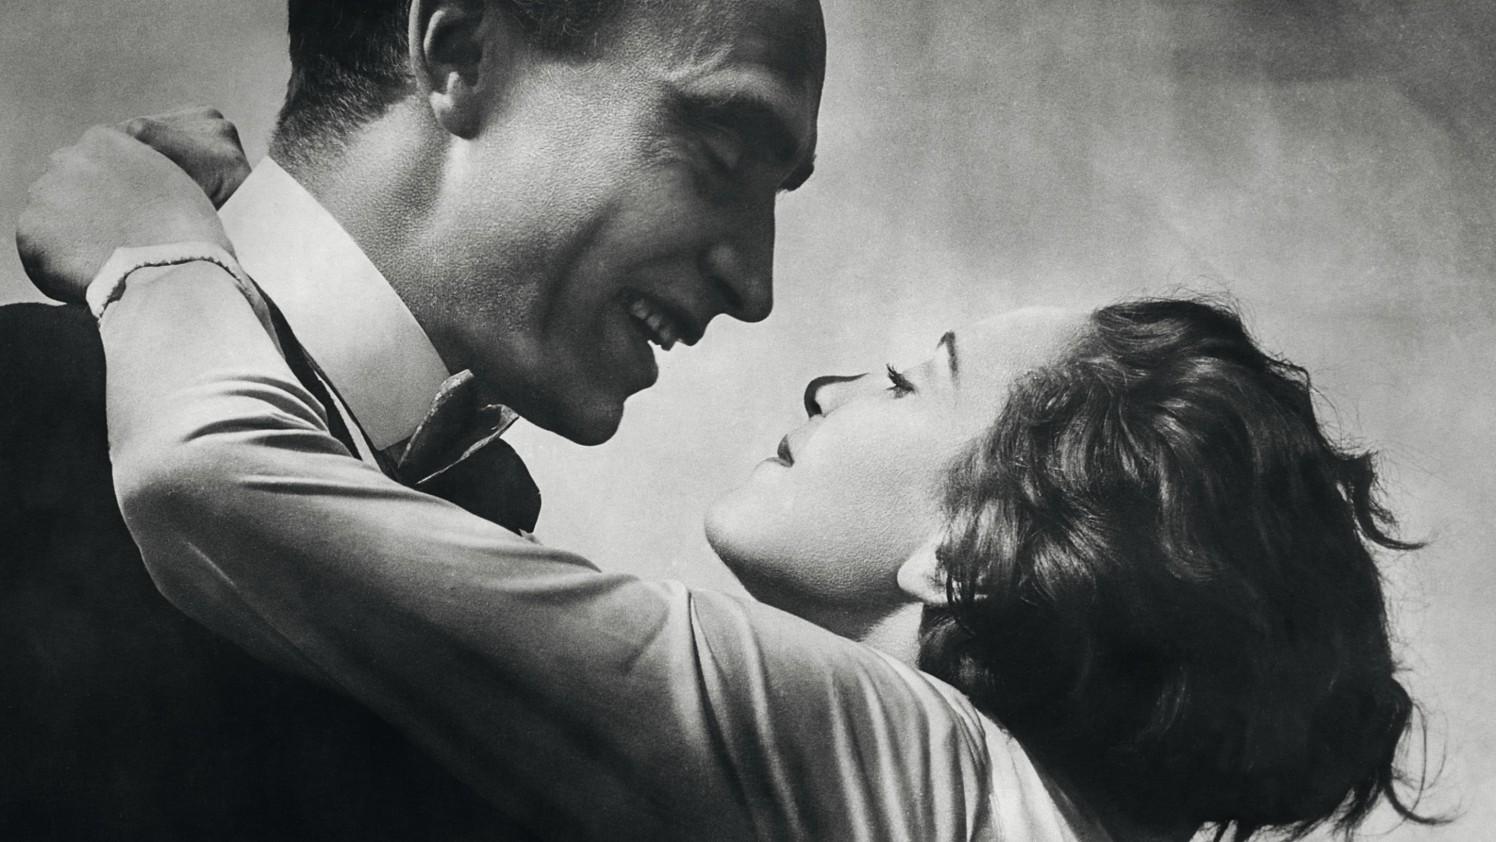 Silent Movie Heritage - Bertelsmann SE & Co  KGaA